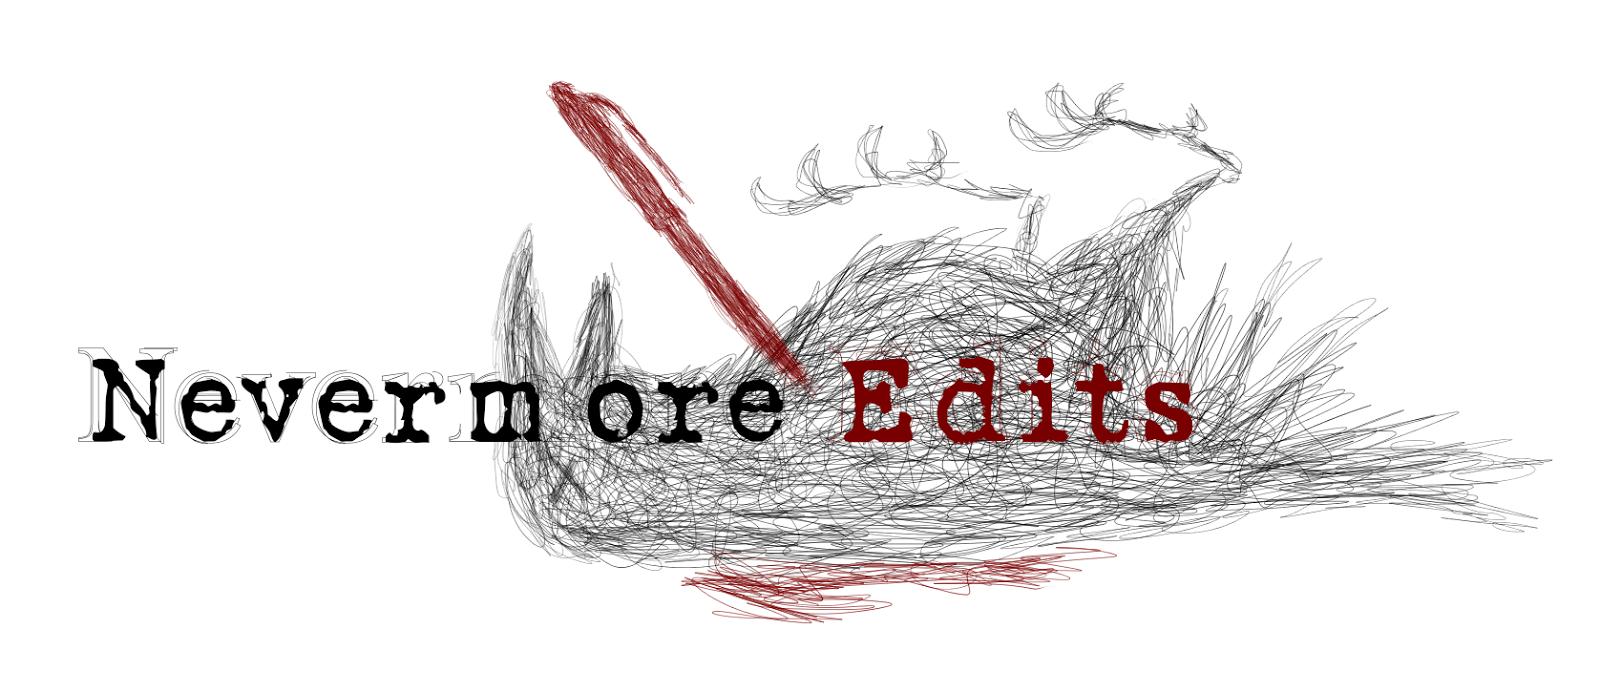 Nevermore Edits